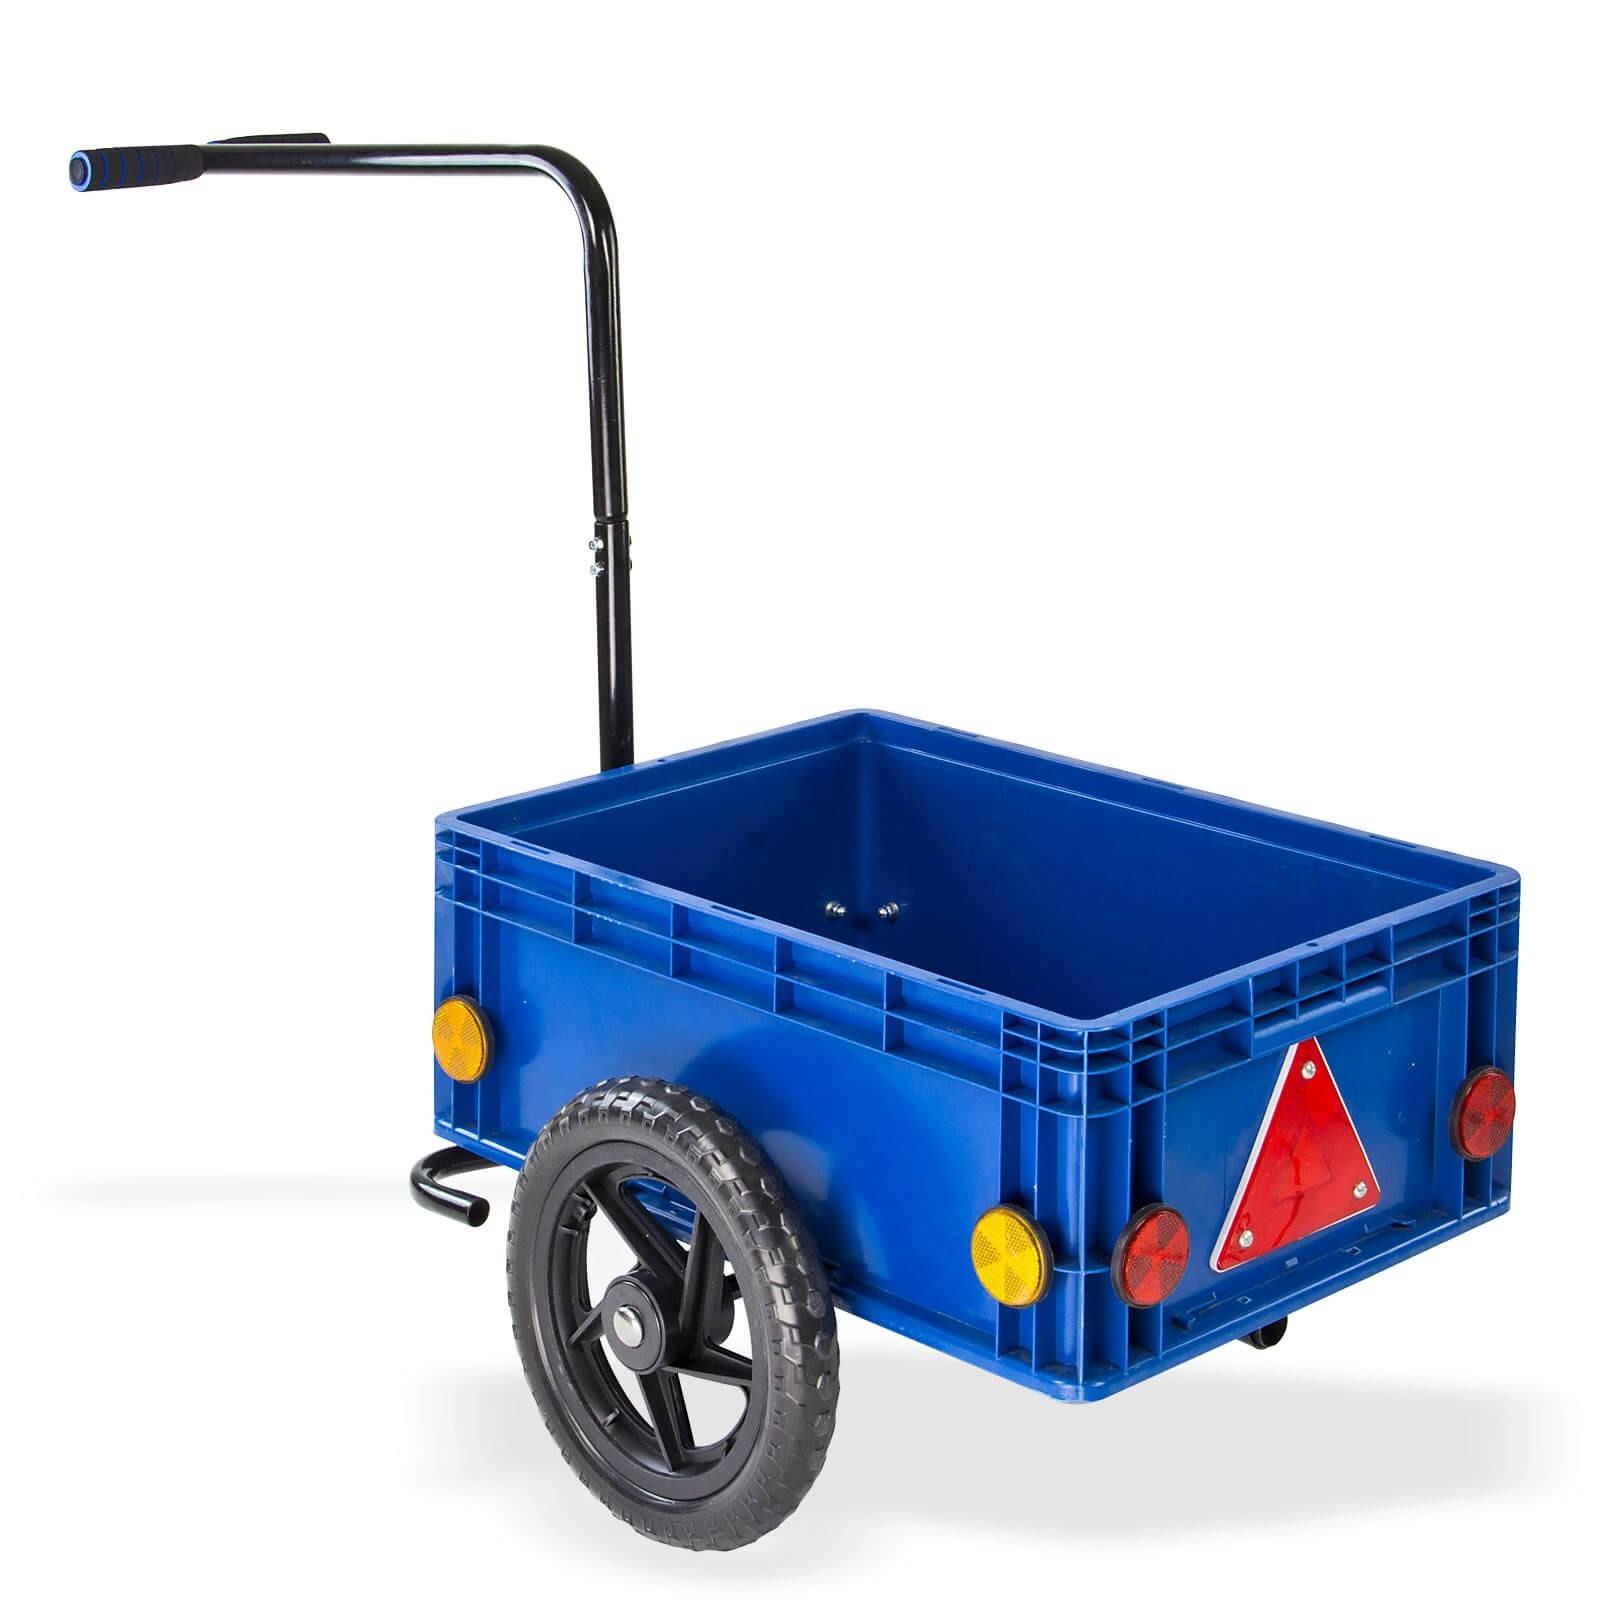 handwagen bollerwagen transportwagen transportkarre langeoog 45 liter ebay. Black Bedroom Furniture Sets. Home Design Ideas